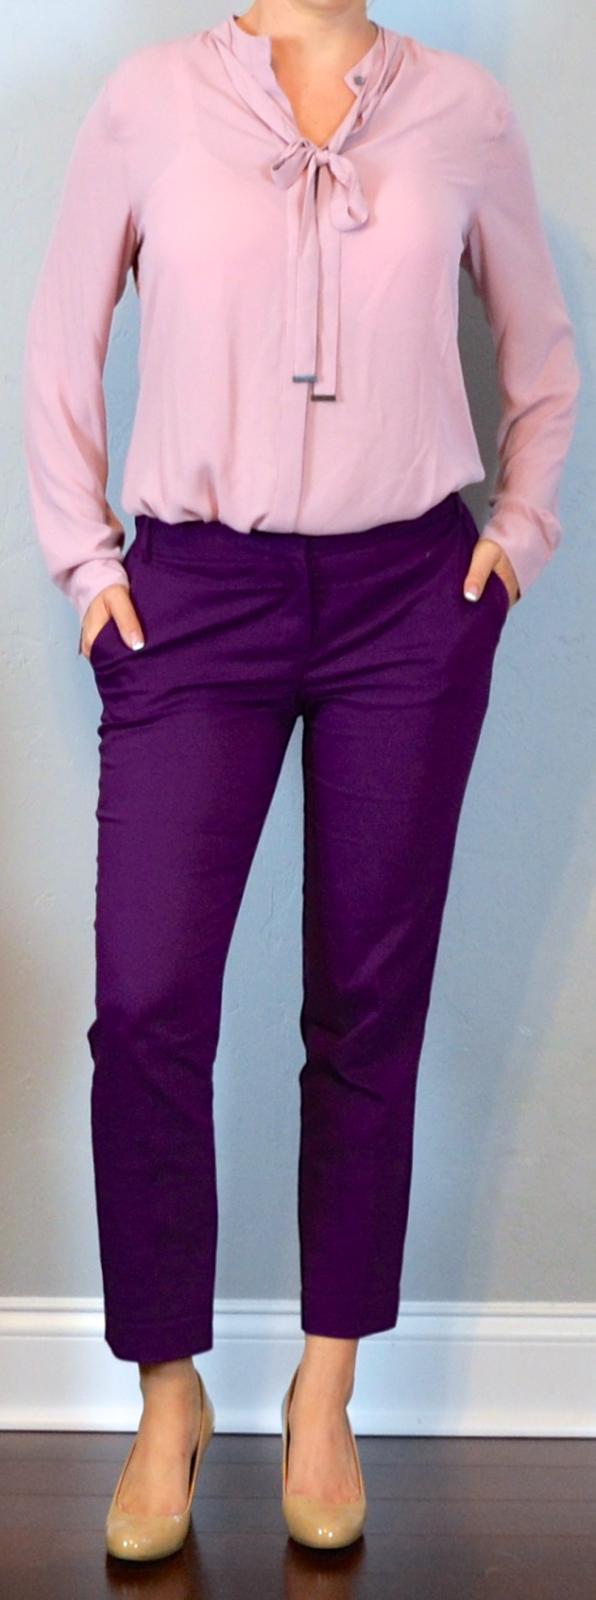 5fcda-pinktiepurpleankle